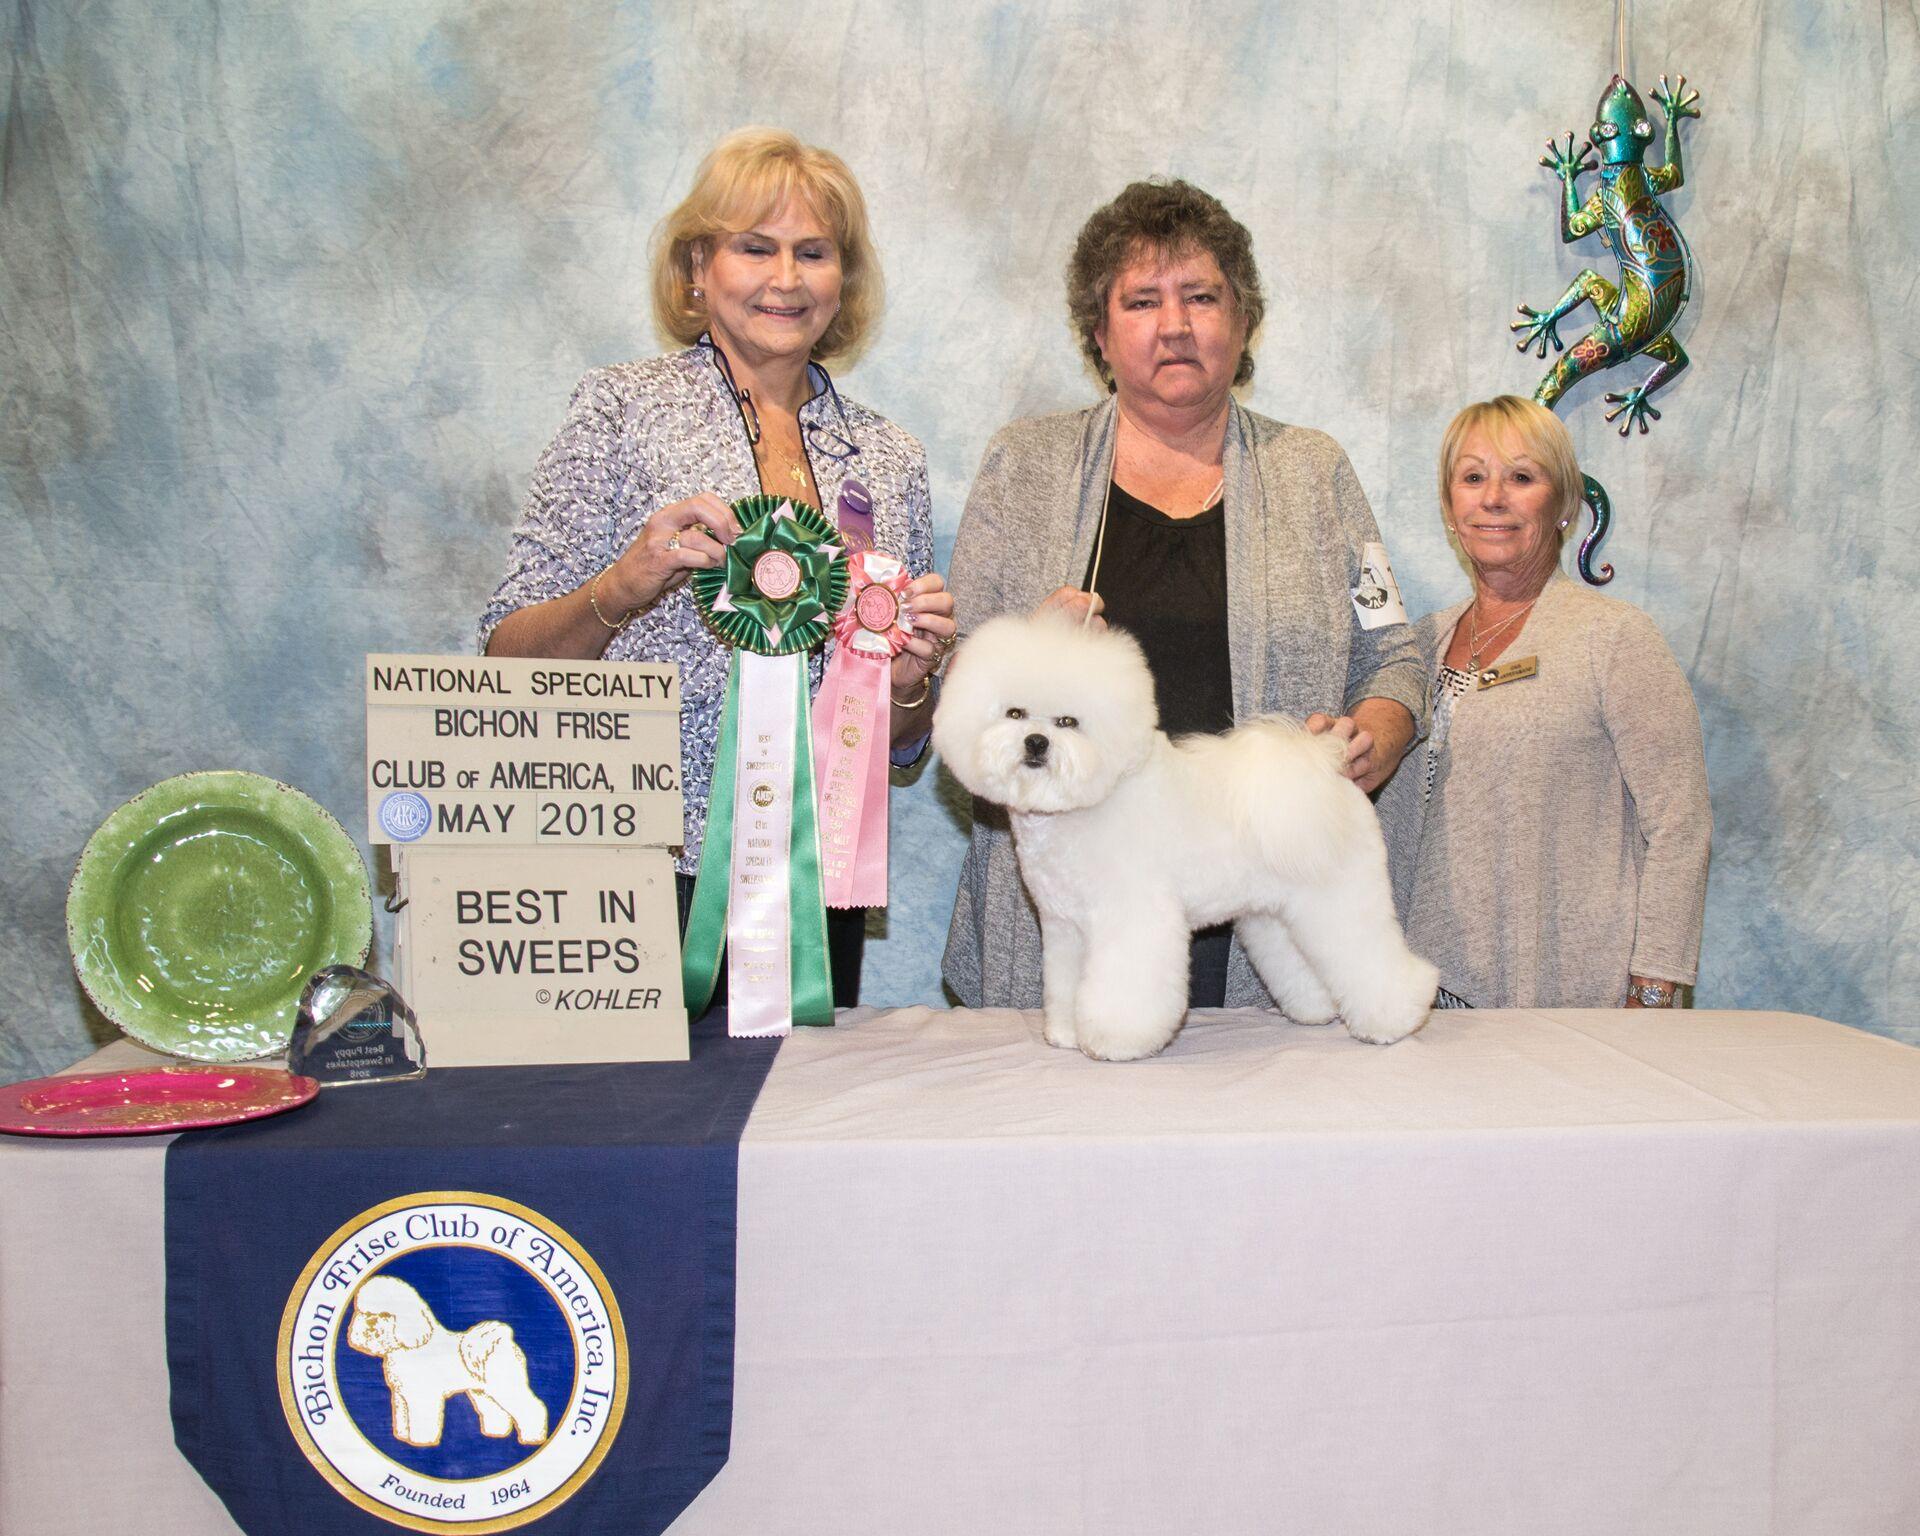 Bichon Frise Club of America   Member of American Kennel Club